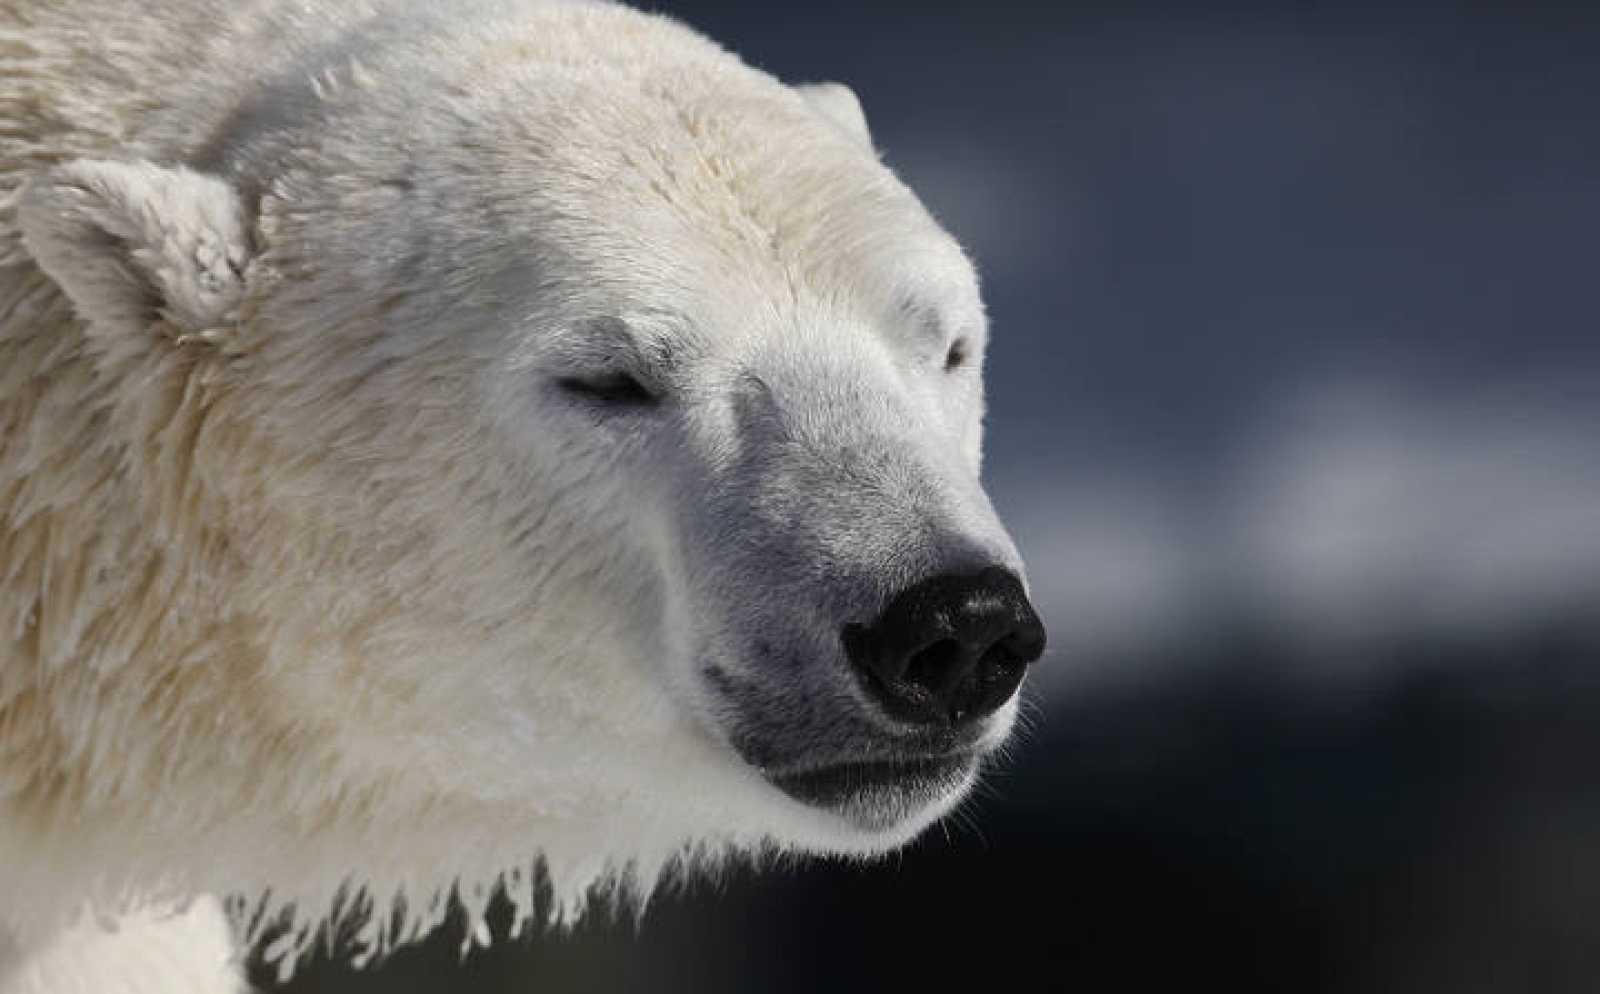 A polar bear is seen at St-Felicien Wildlife Zoo in St-Felicien